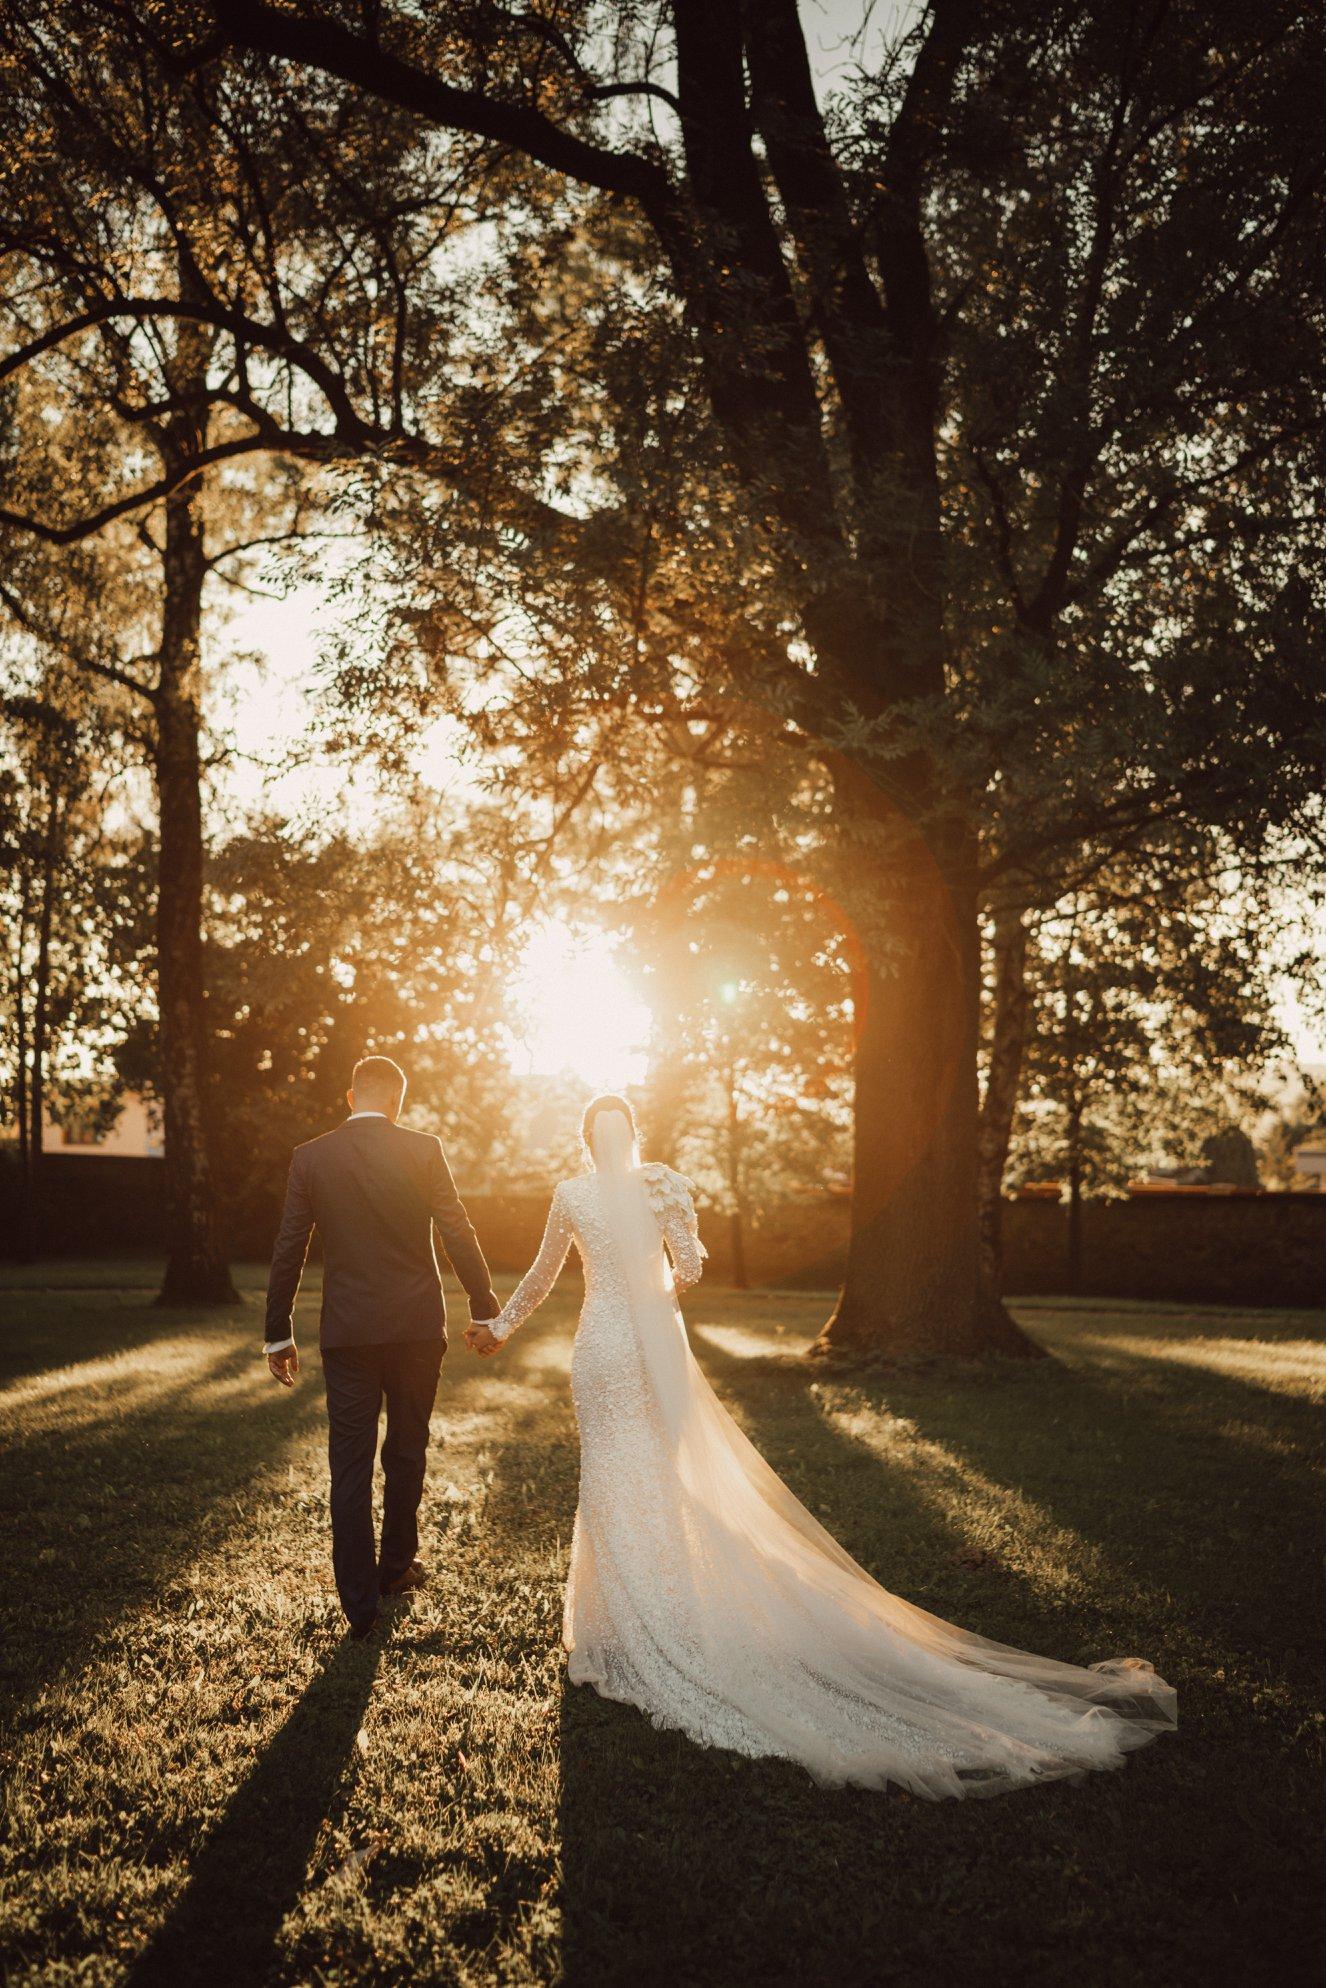 fotenie-svadby-zapad-slnkajpg